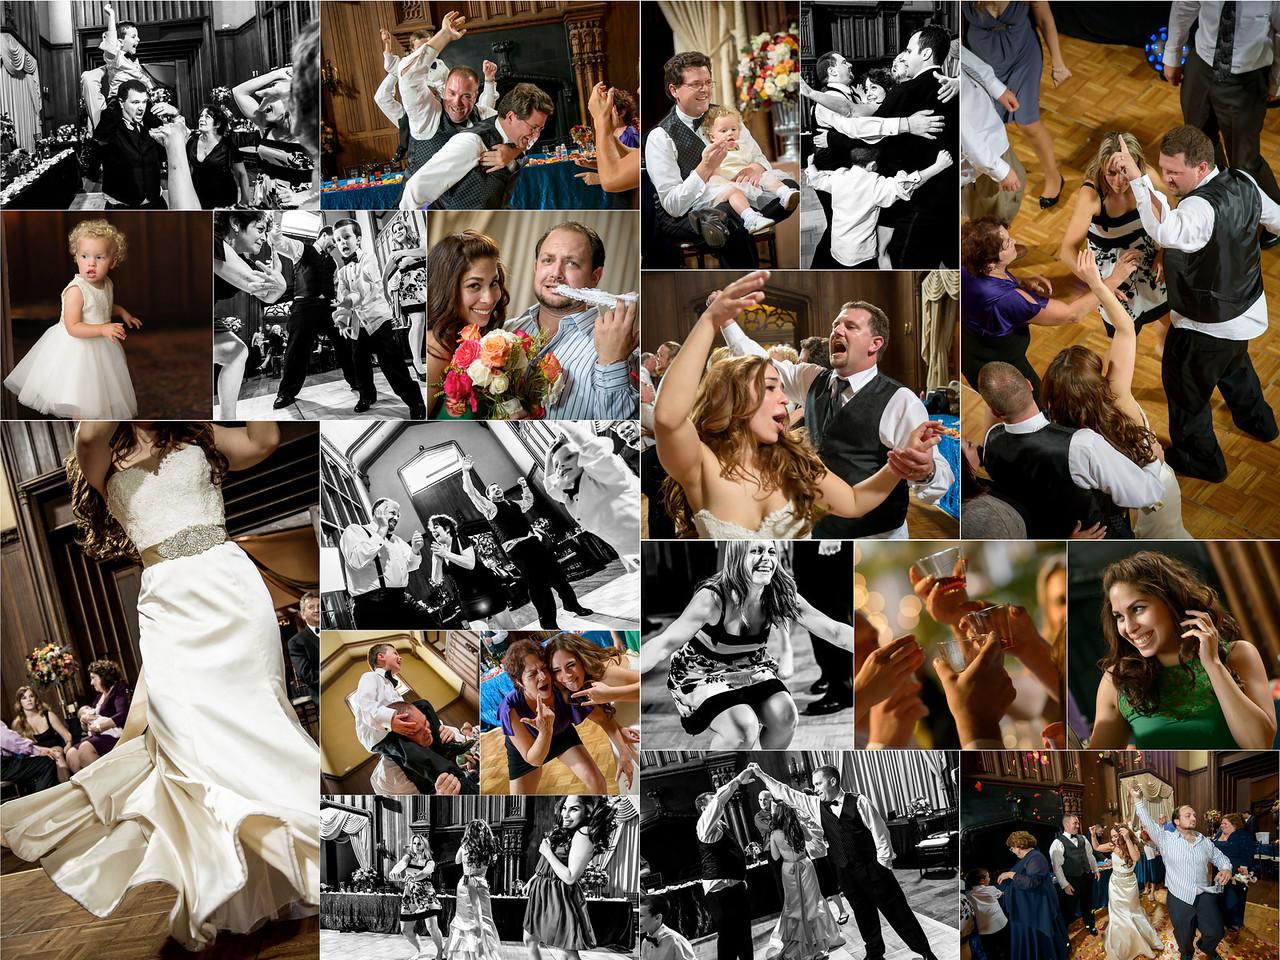 Danielle_and_Tony_Wedding_Photography_4x6_Photo_Board_08